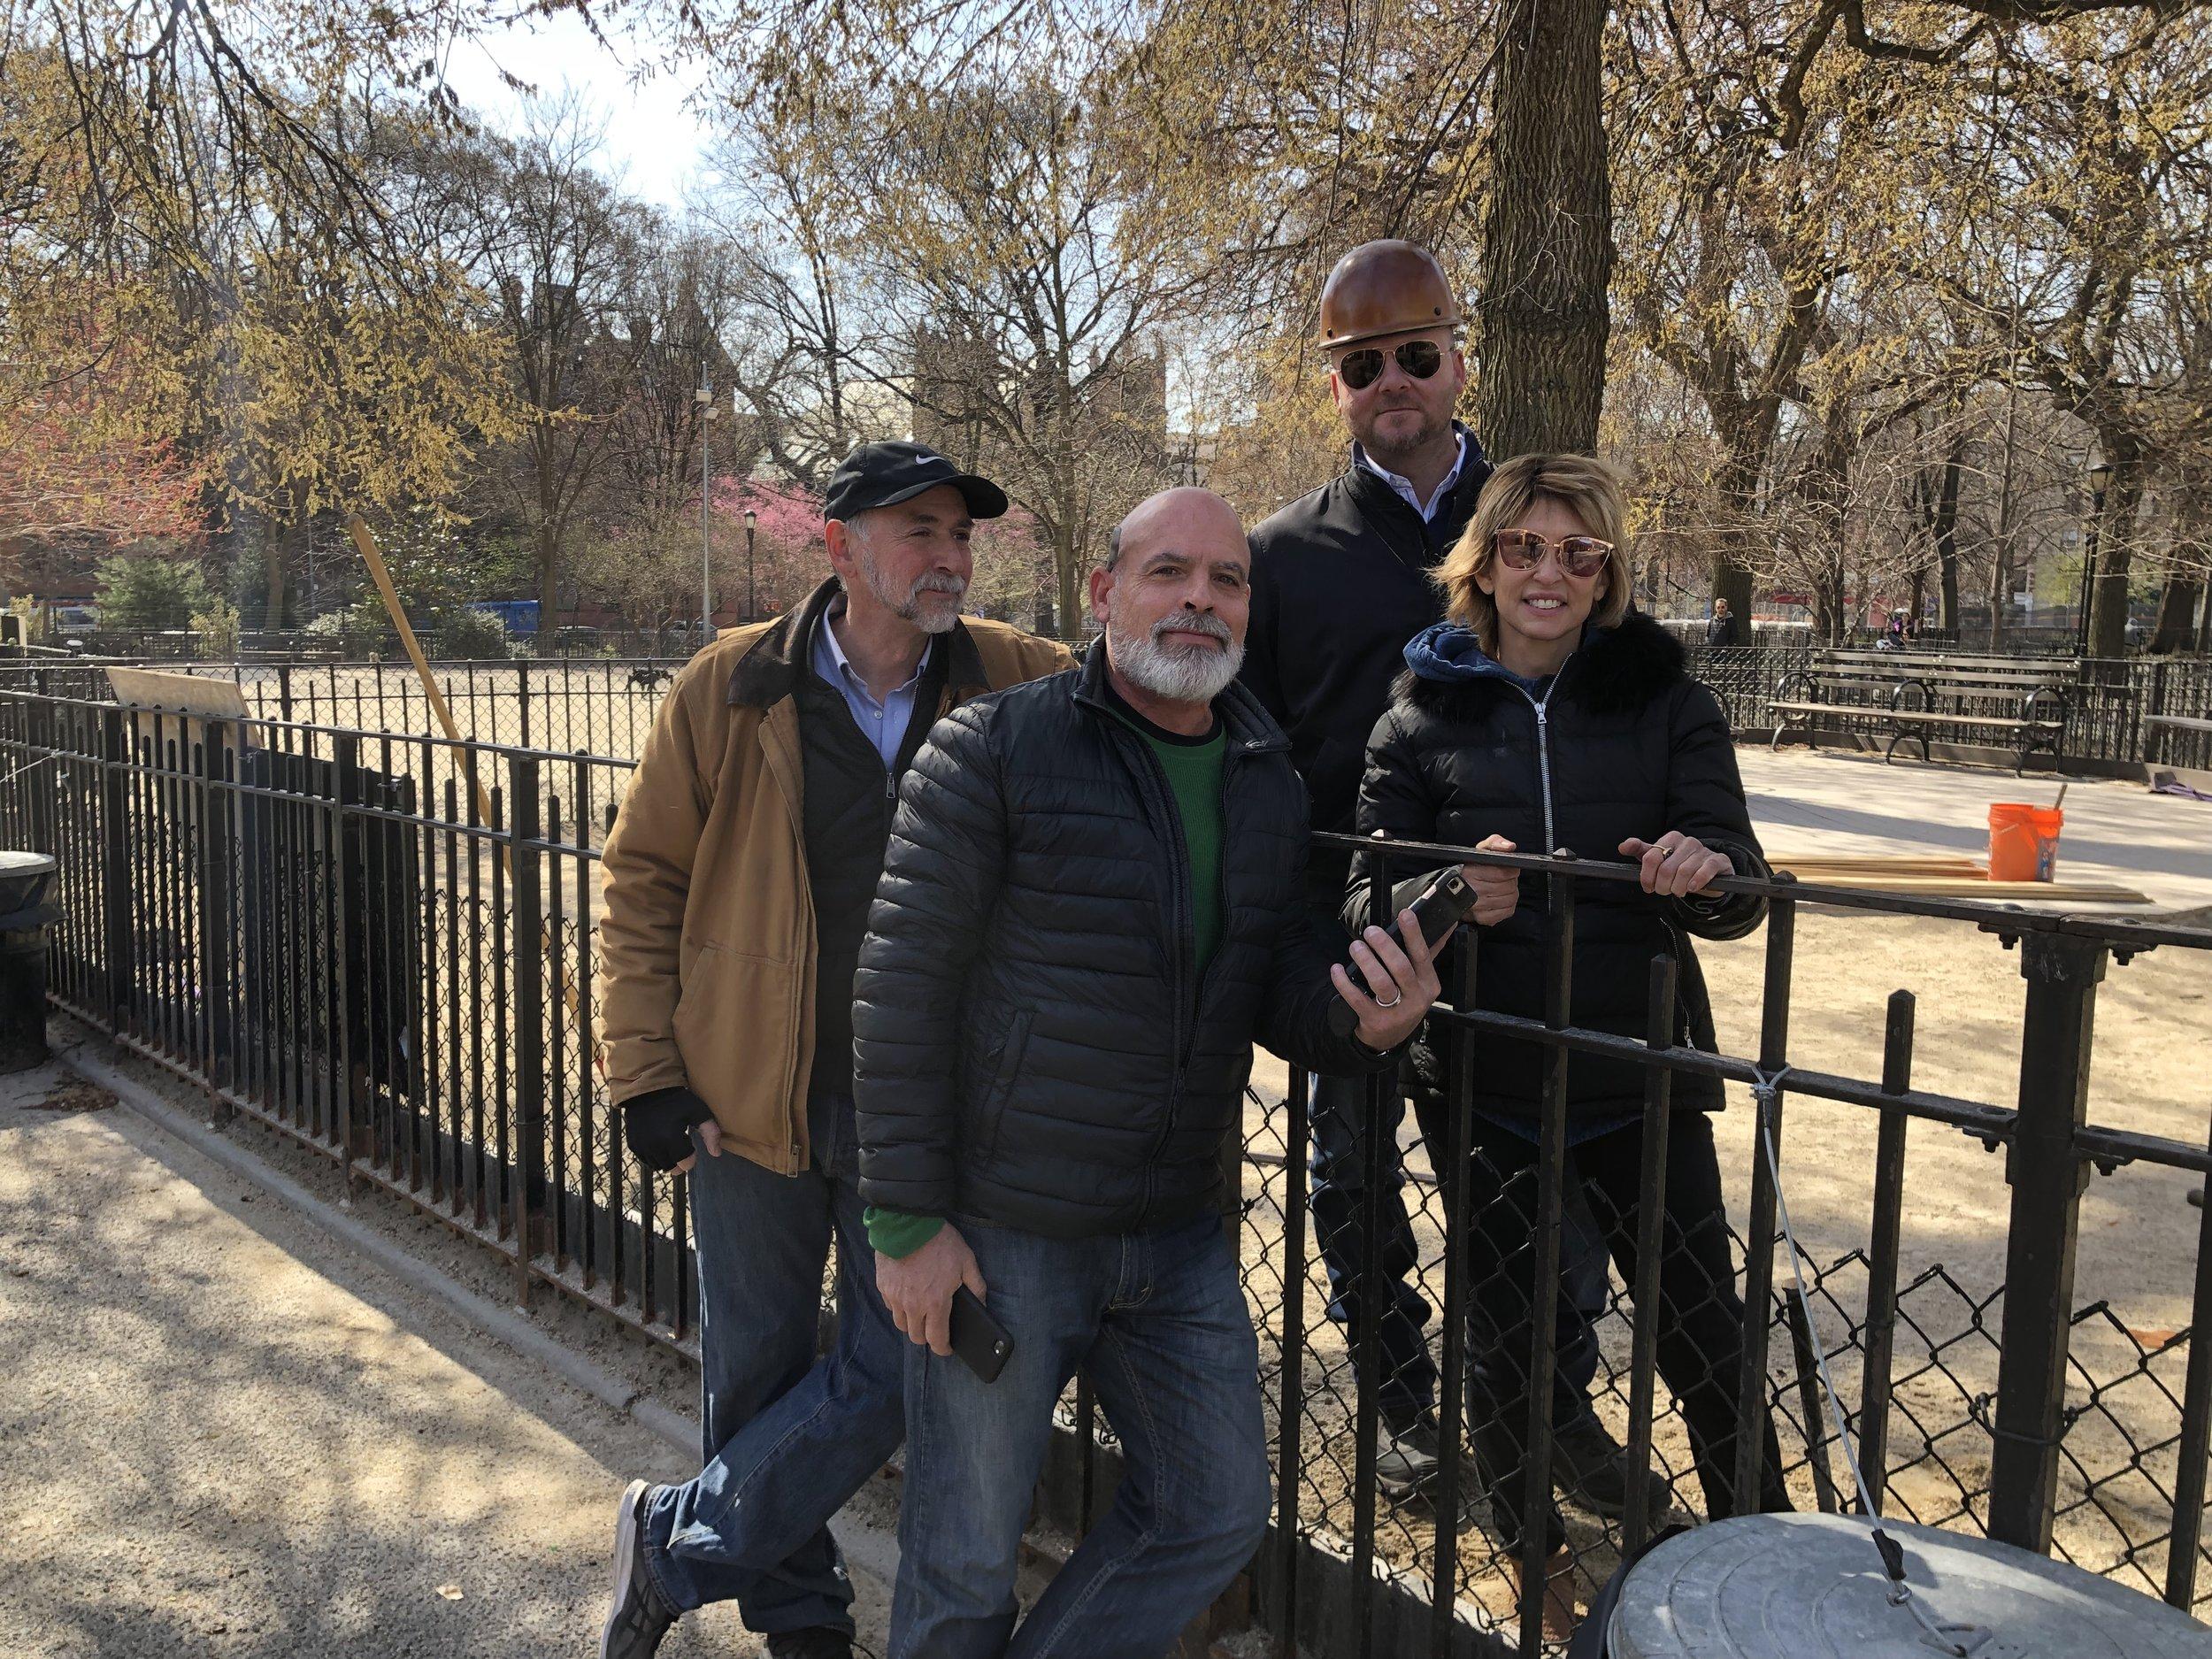 Garrett Rosso, Bradley Romaker from NYC Parks Dept & Susan Alexander, the contractor for Tech Grass, start the installation